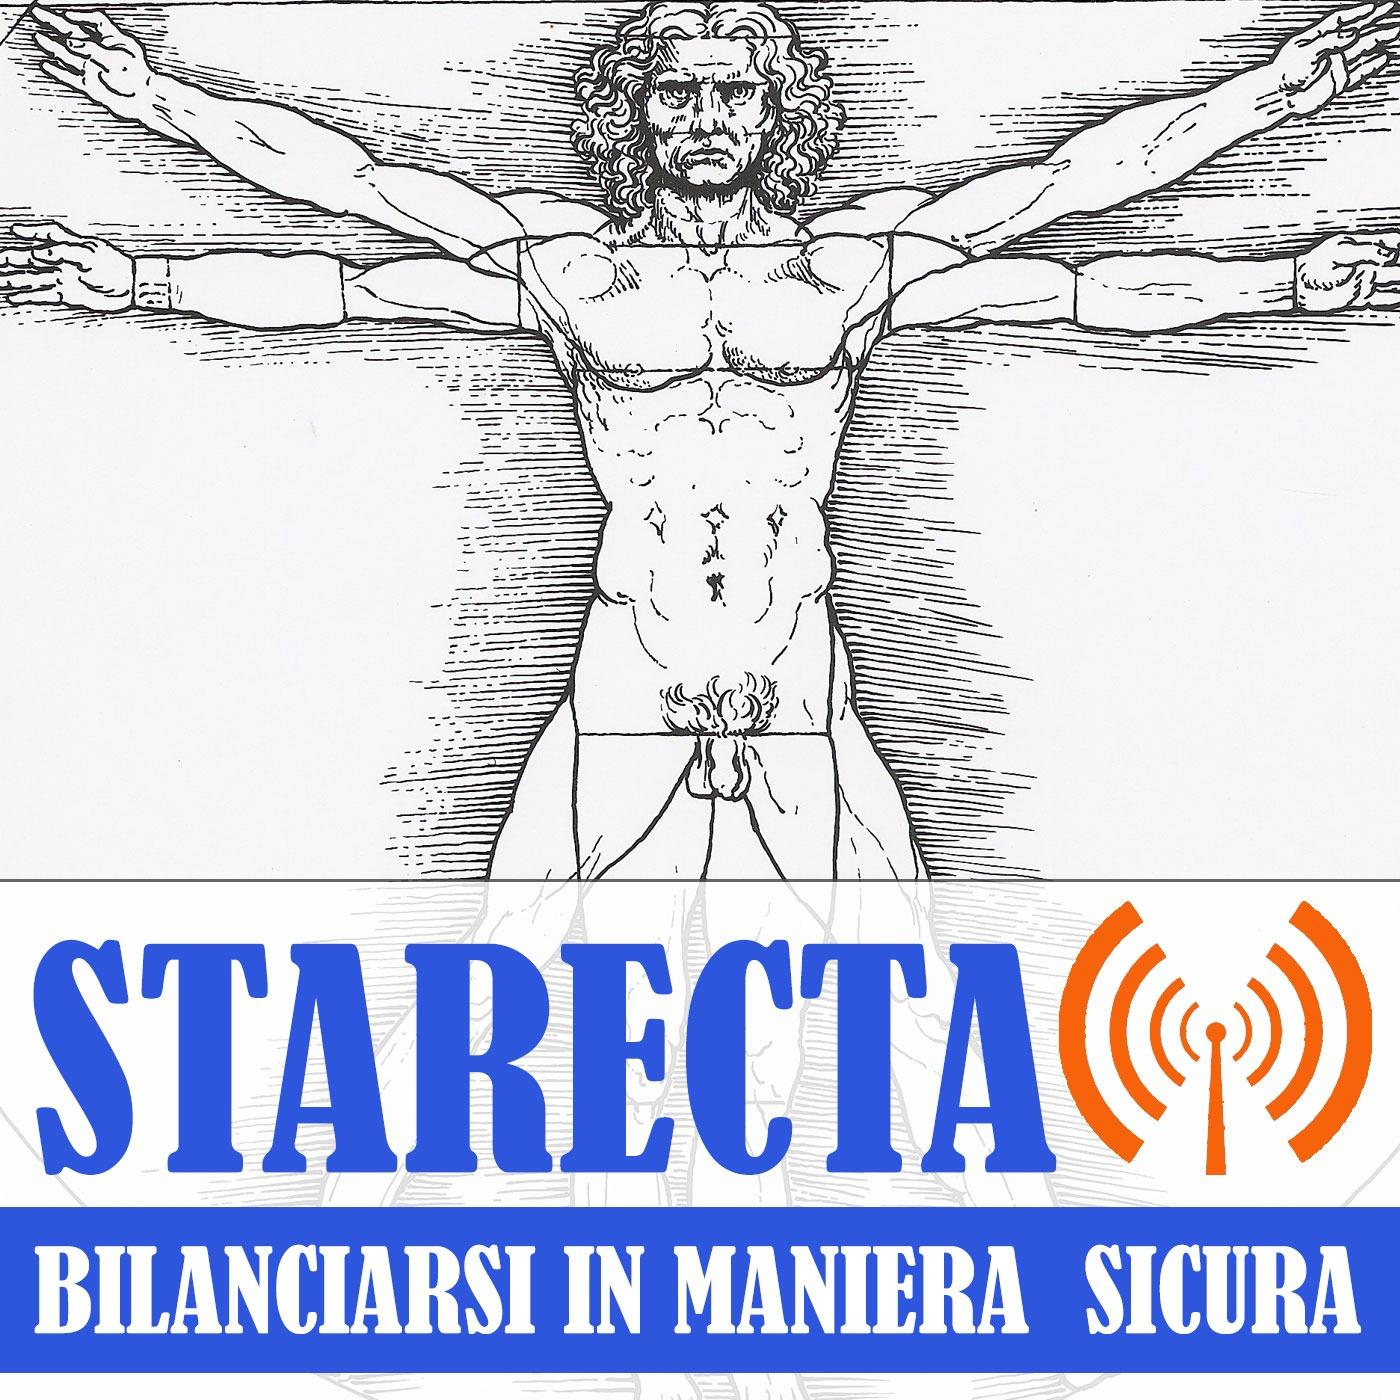 Starecta